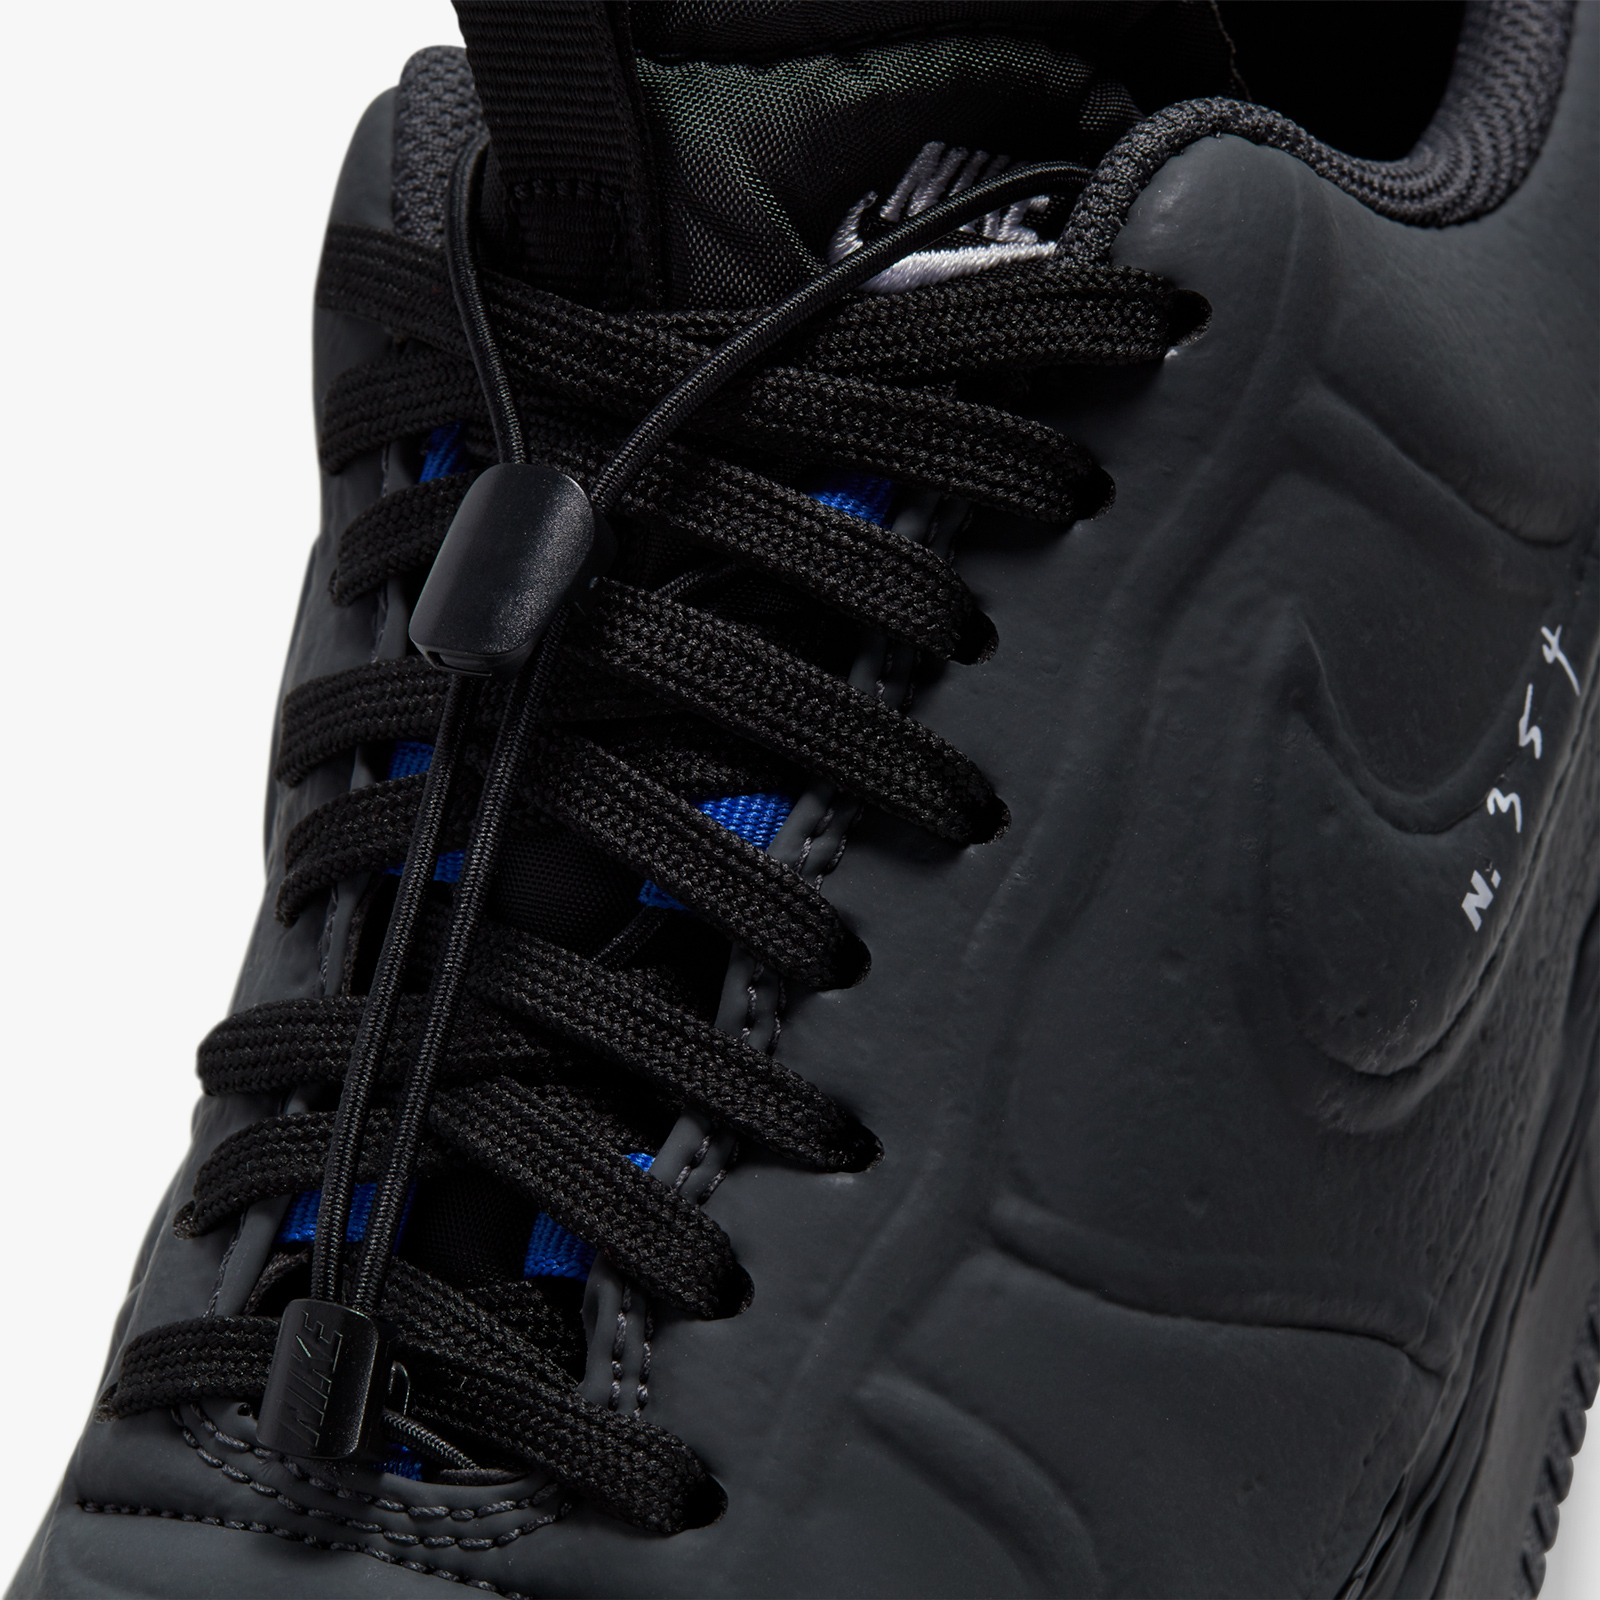 Nike Air Force 1 Experimental - Cv1754-001 - SNS | sneakers ...